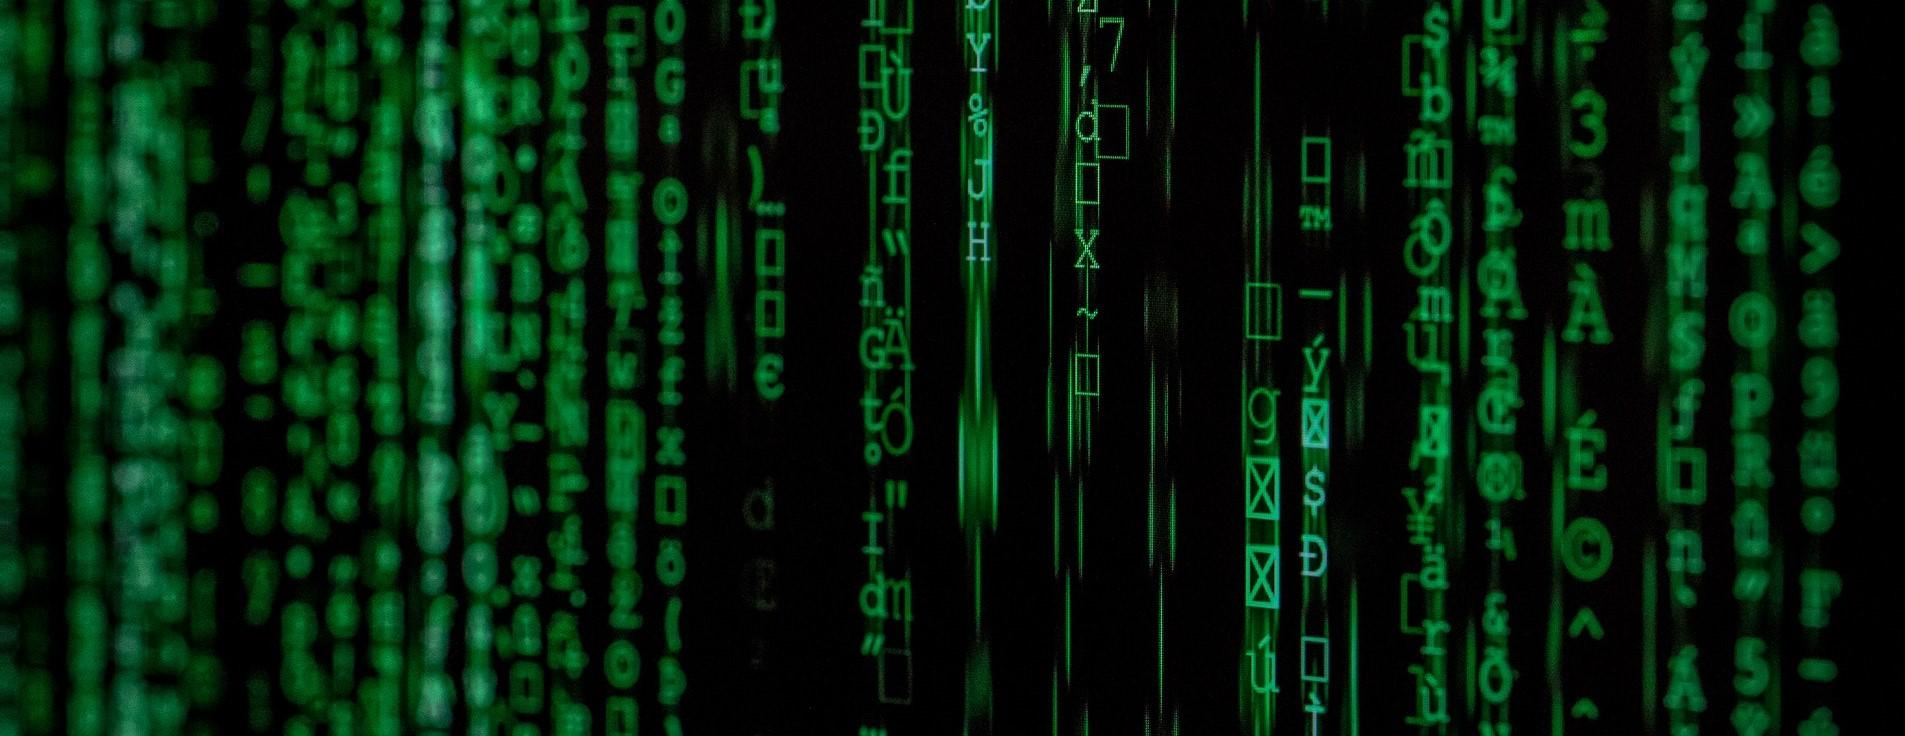 O que é ataque Ransomware e como proteger sua empresa